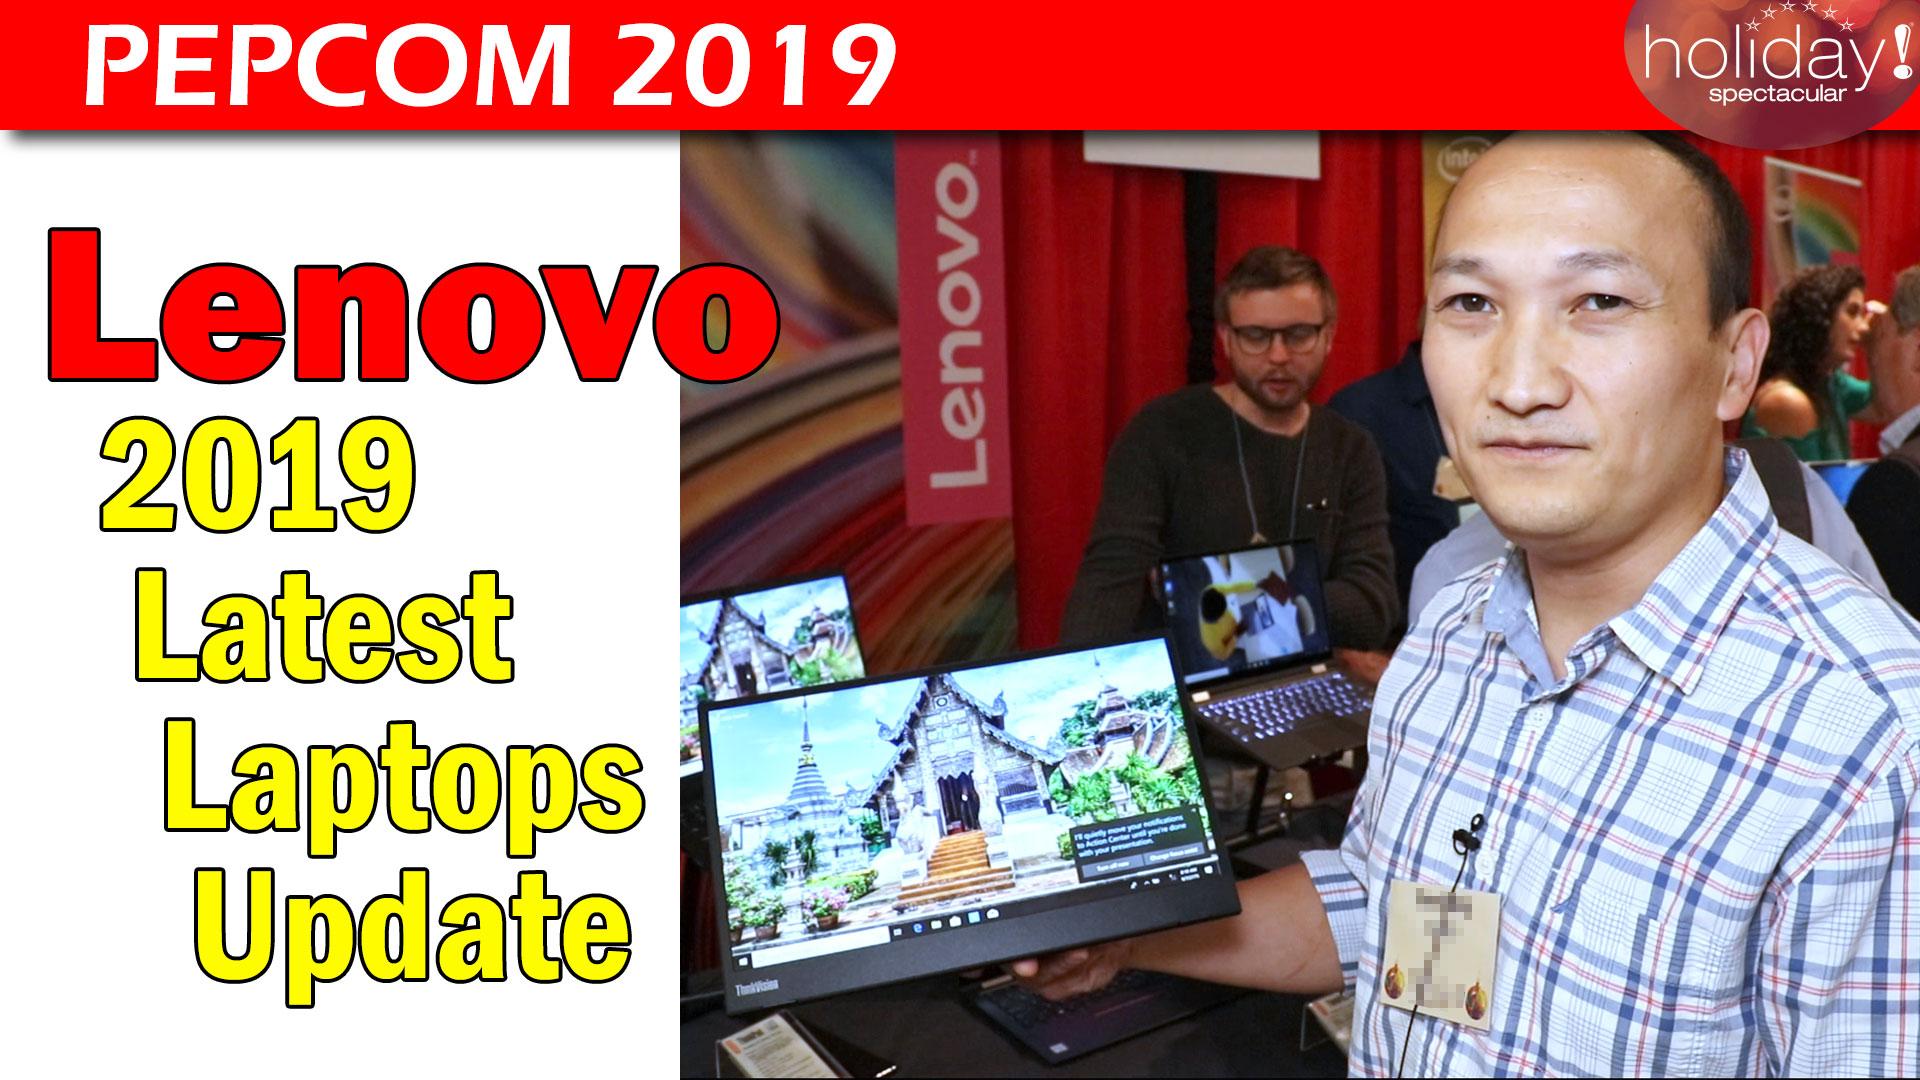 Lenovo Laptop update 2019